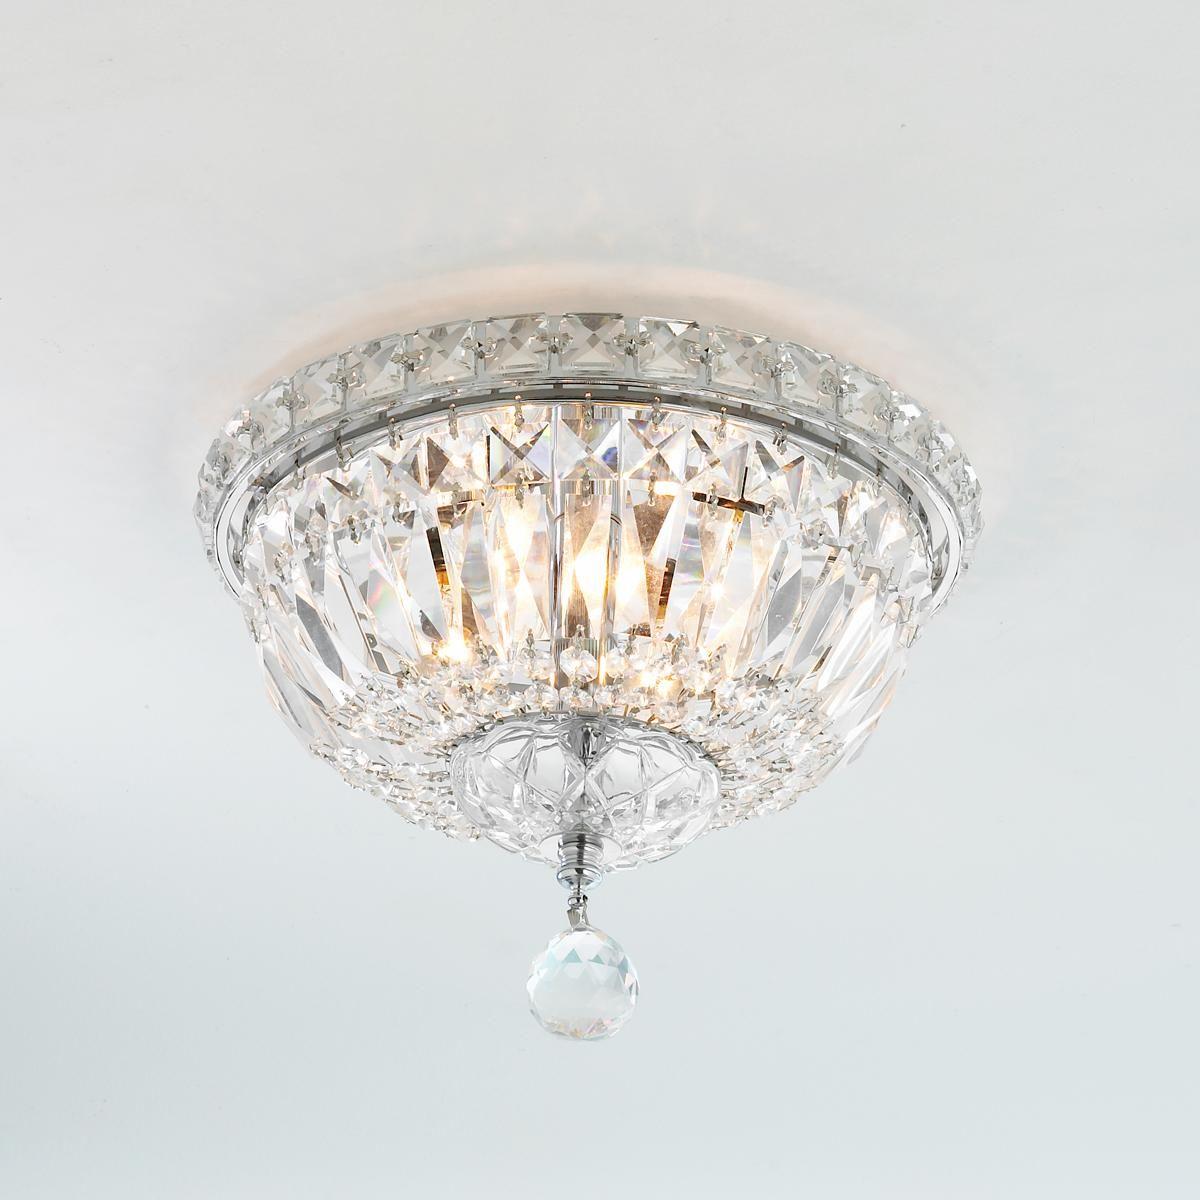 French Empire 4 Light Crystal Flush Mount Ceiling Light 10 Wide